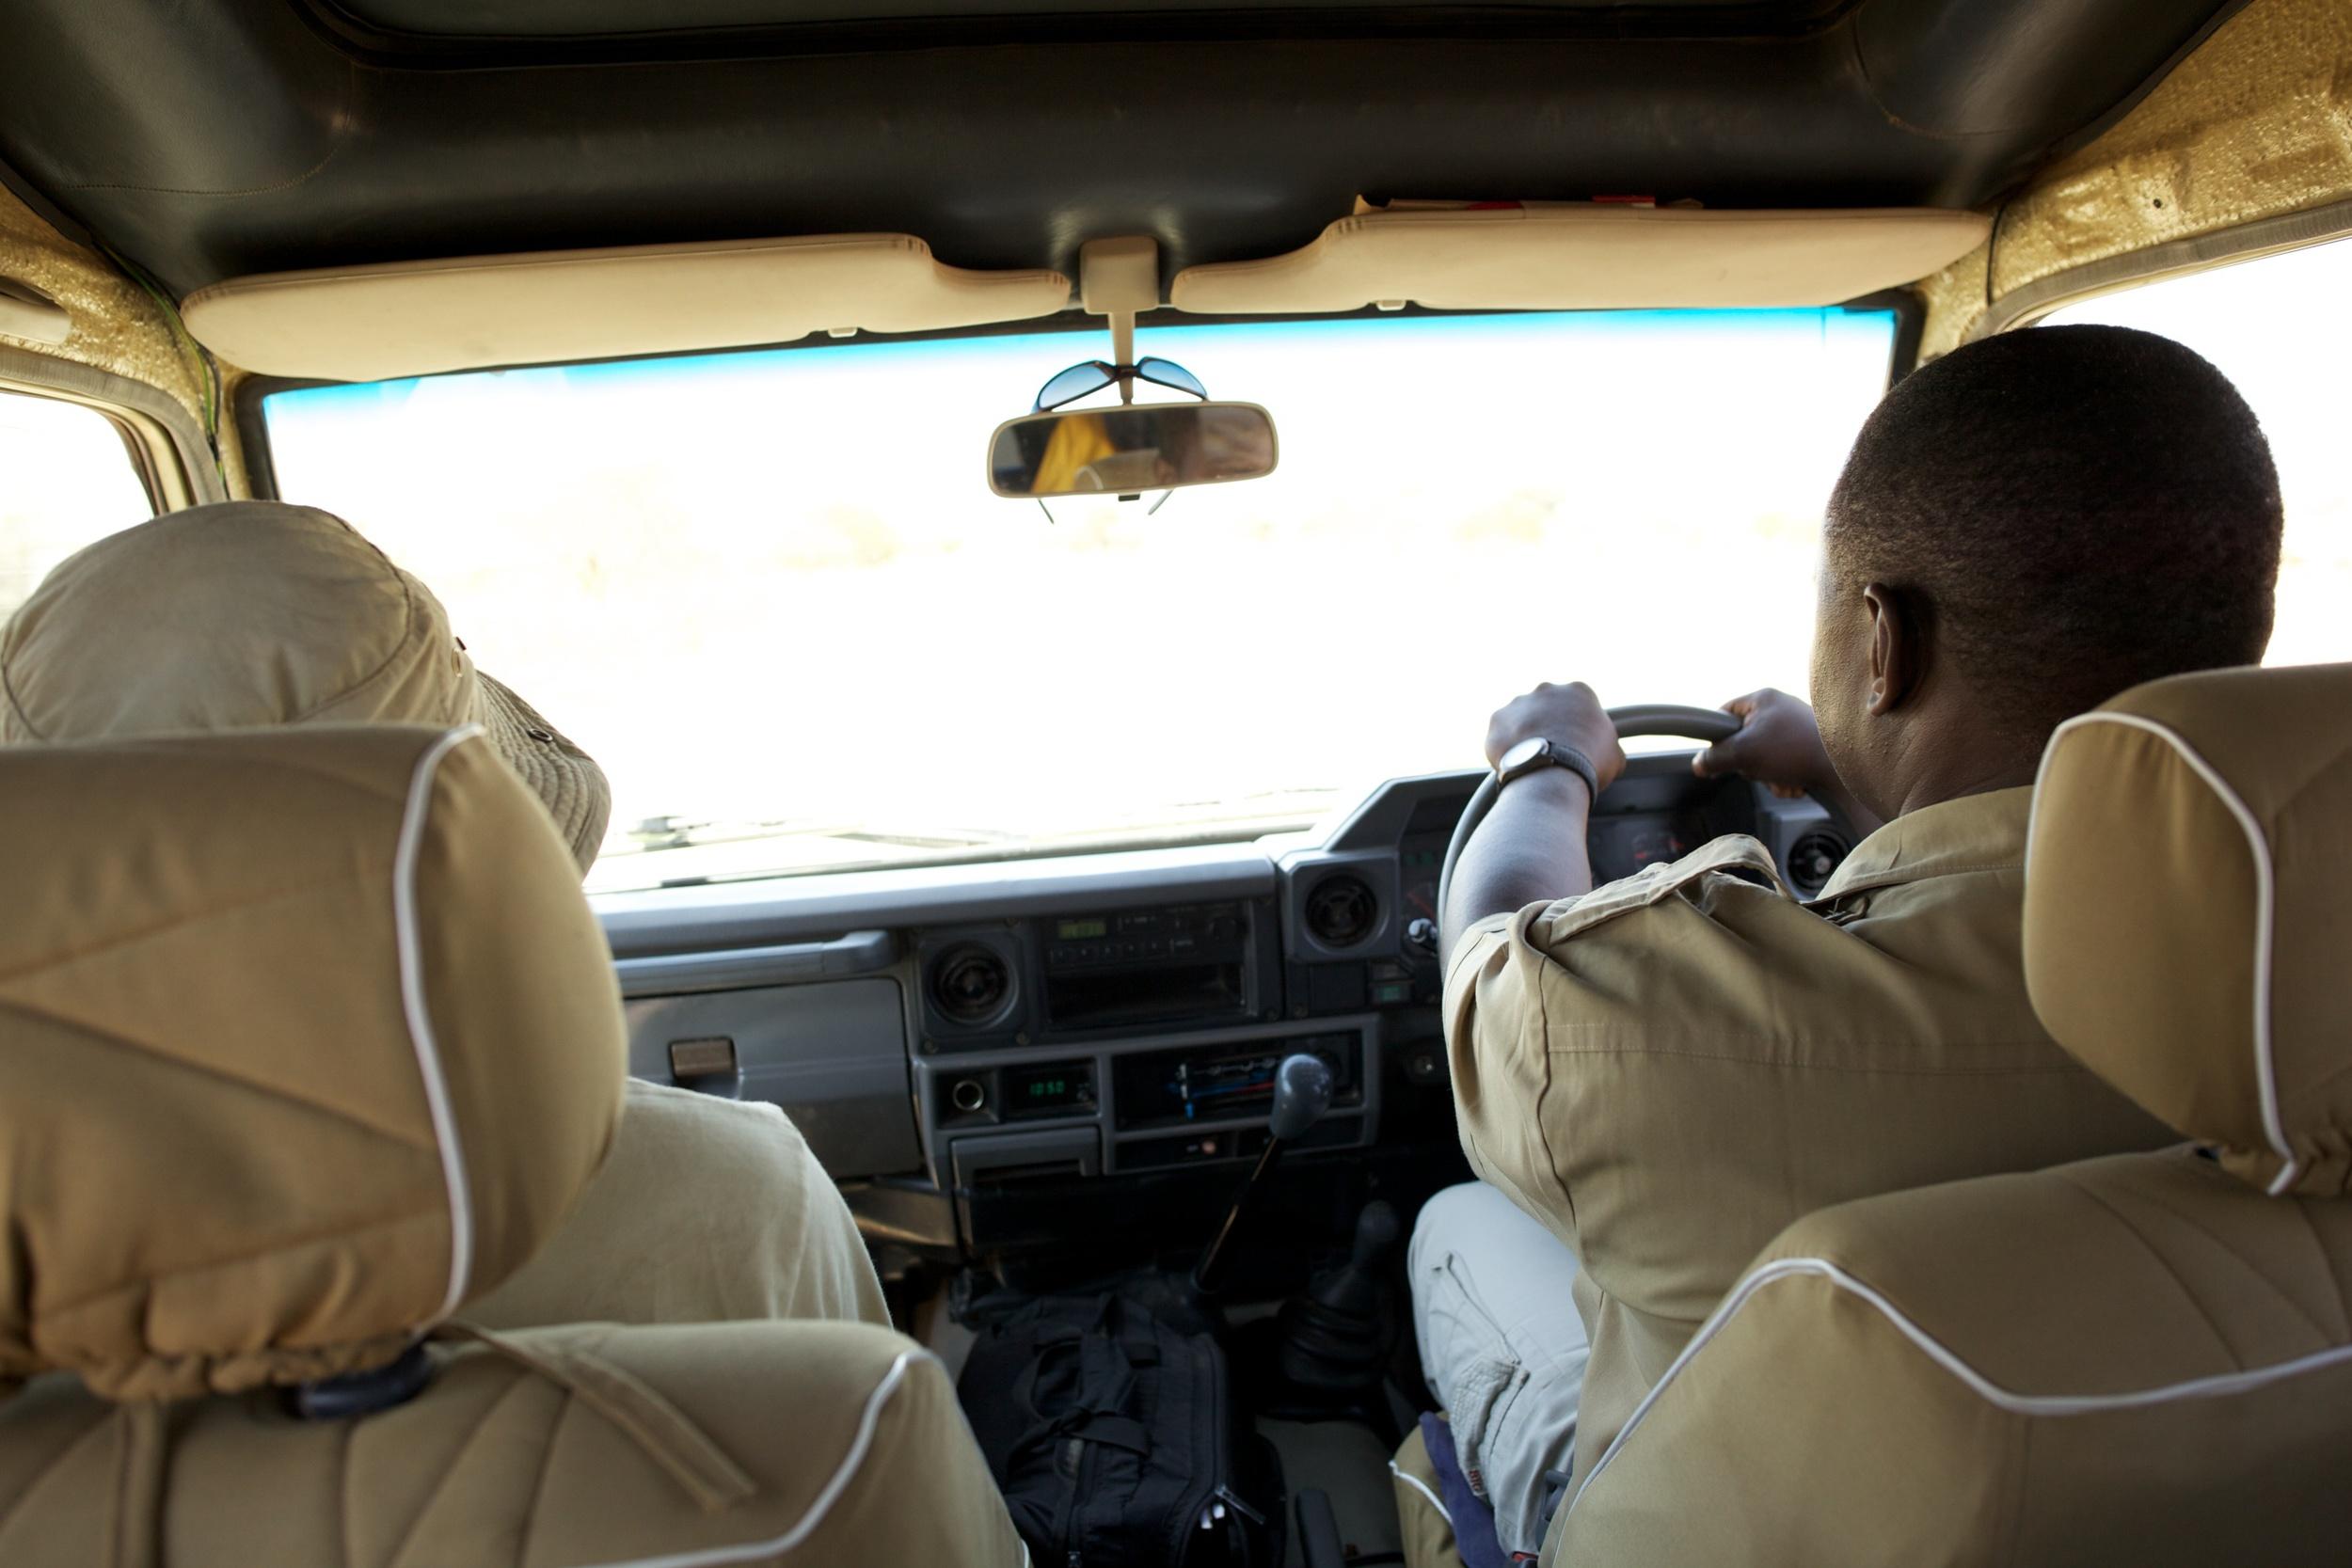 On the way to Ngorongoro, Tanzania